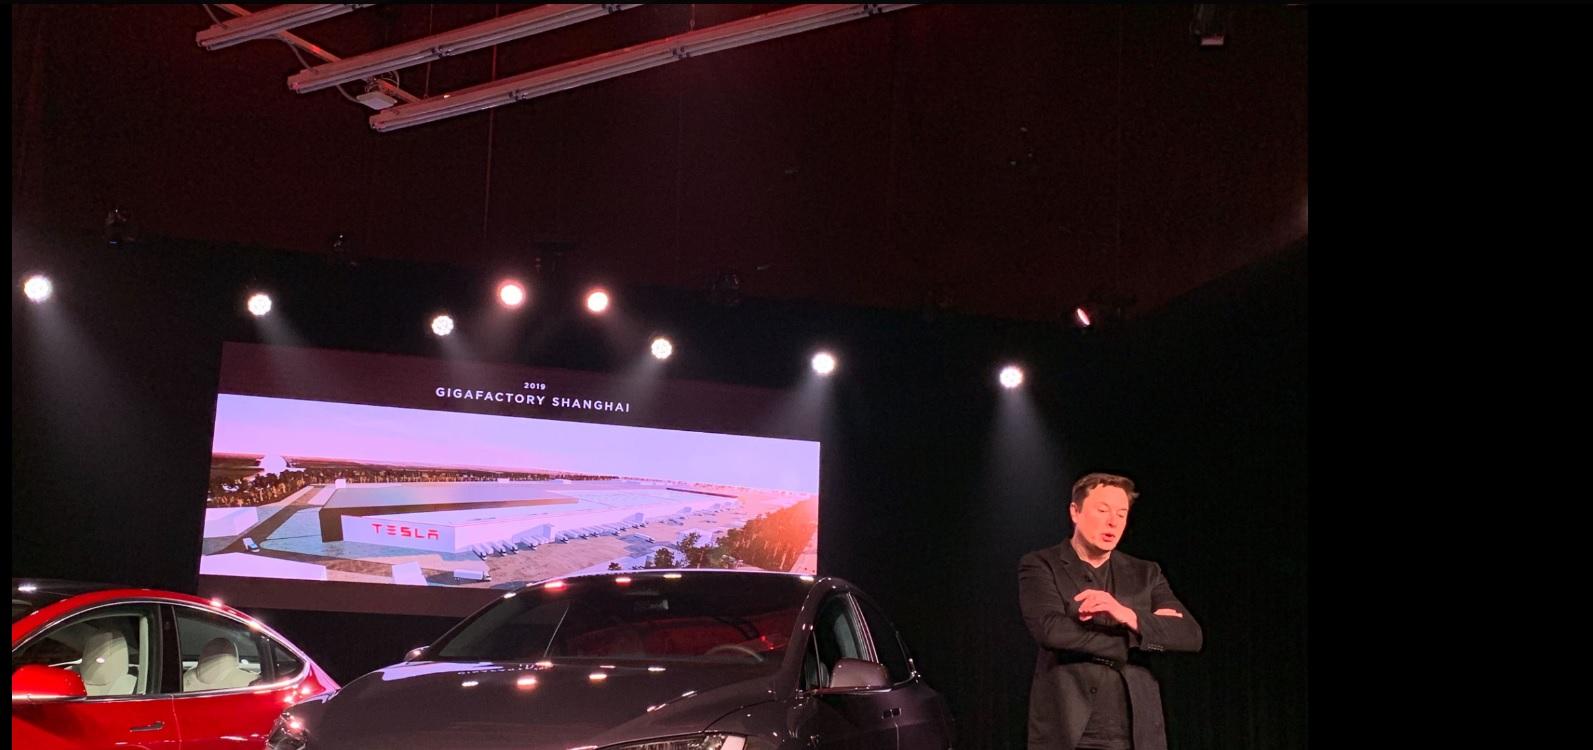 Shanghai-Gigafactory-concept